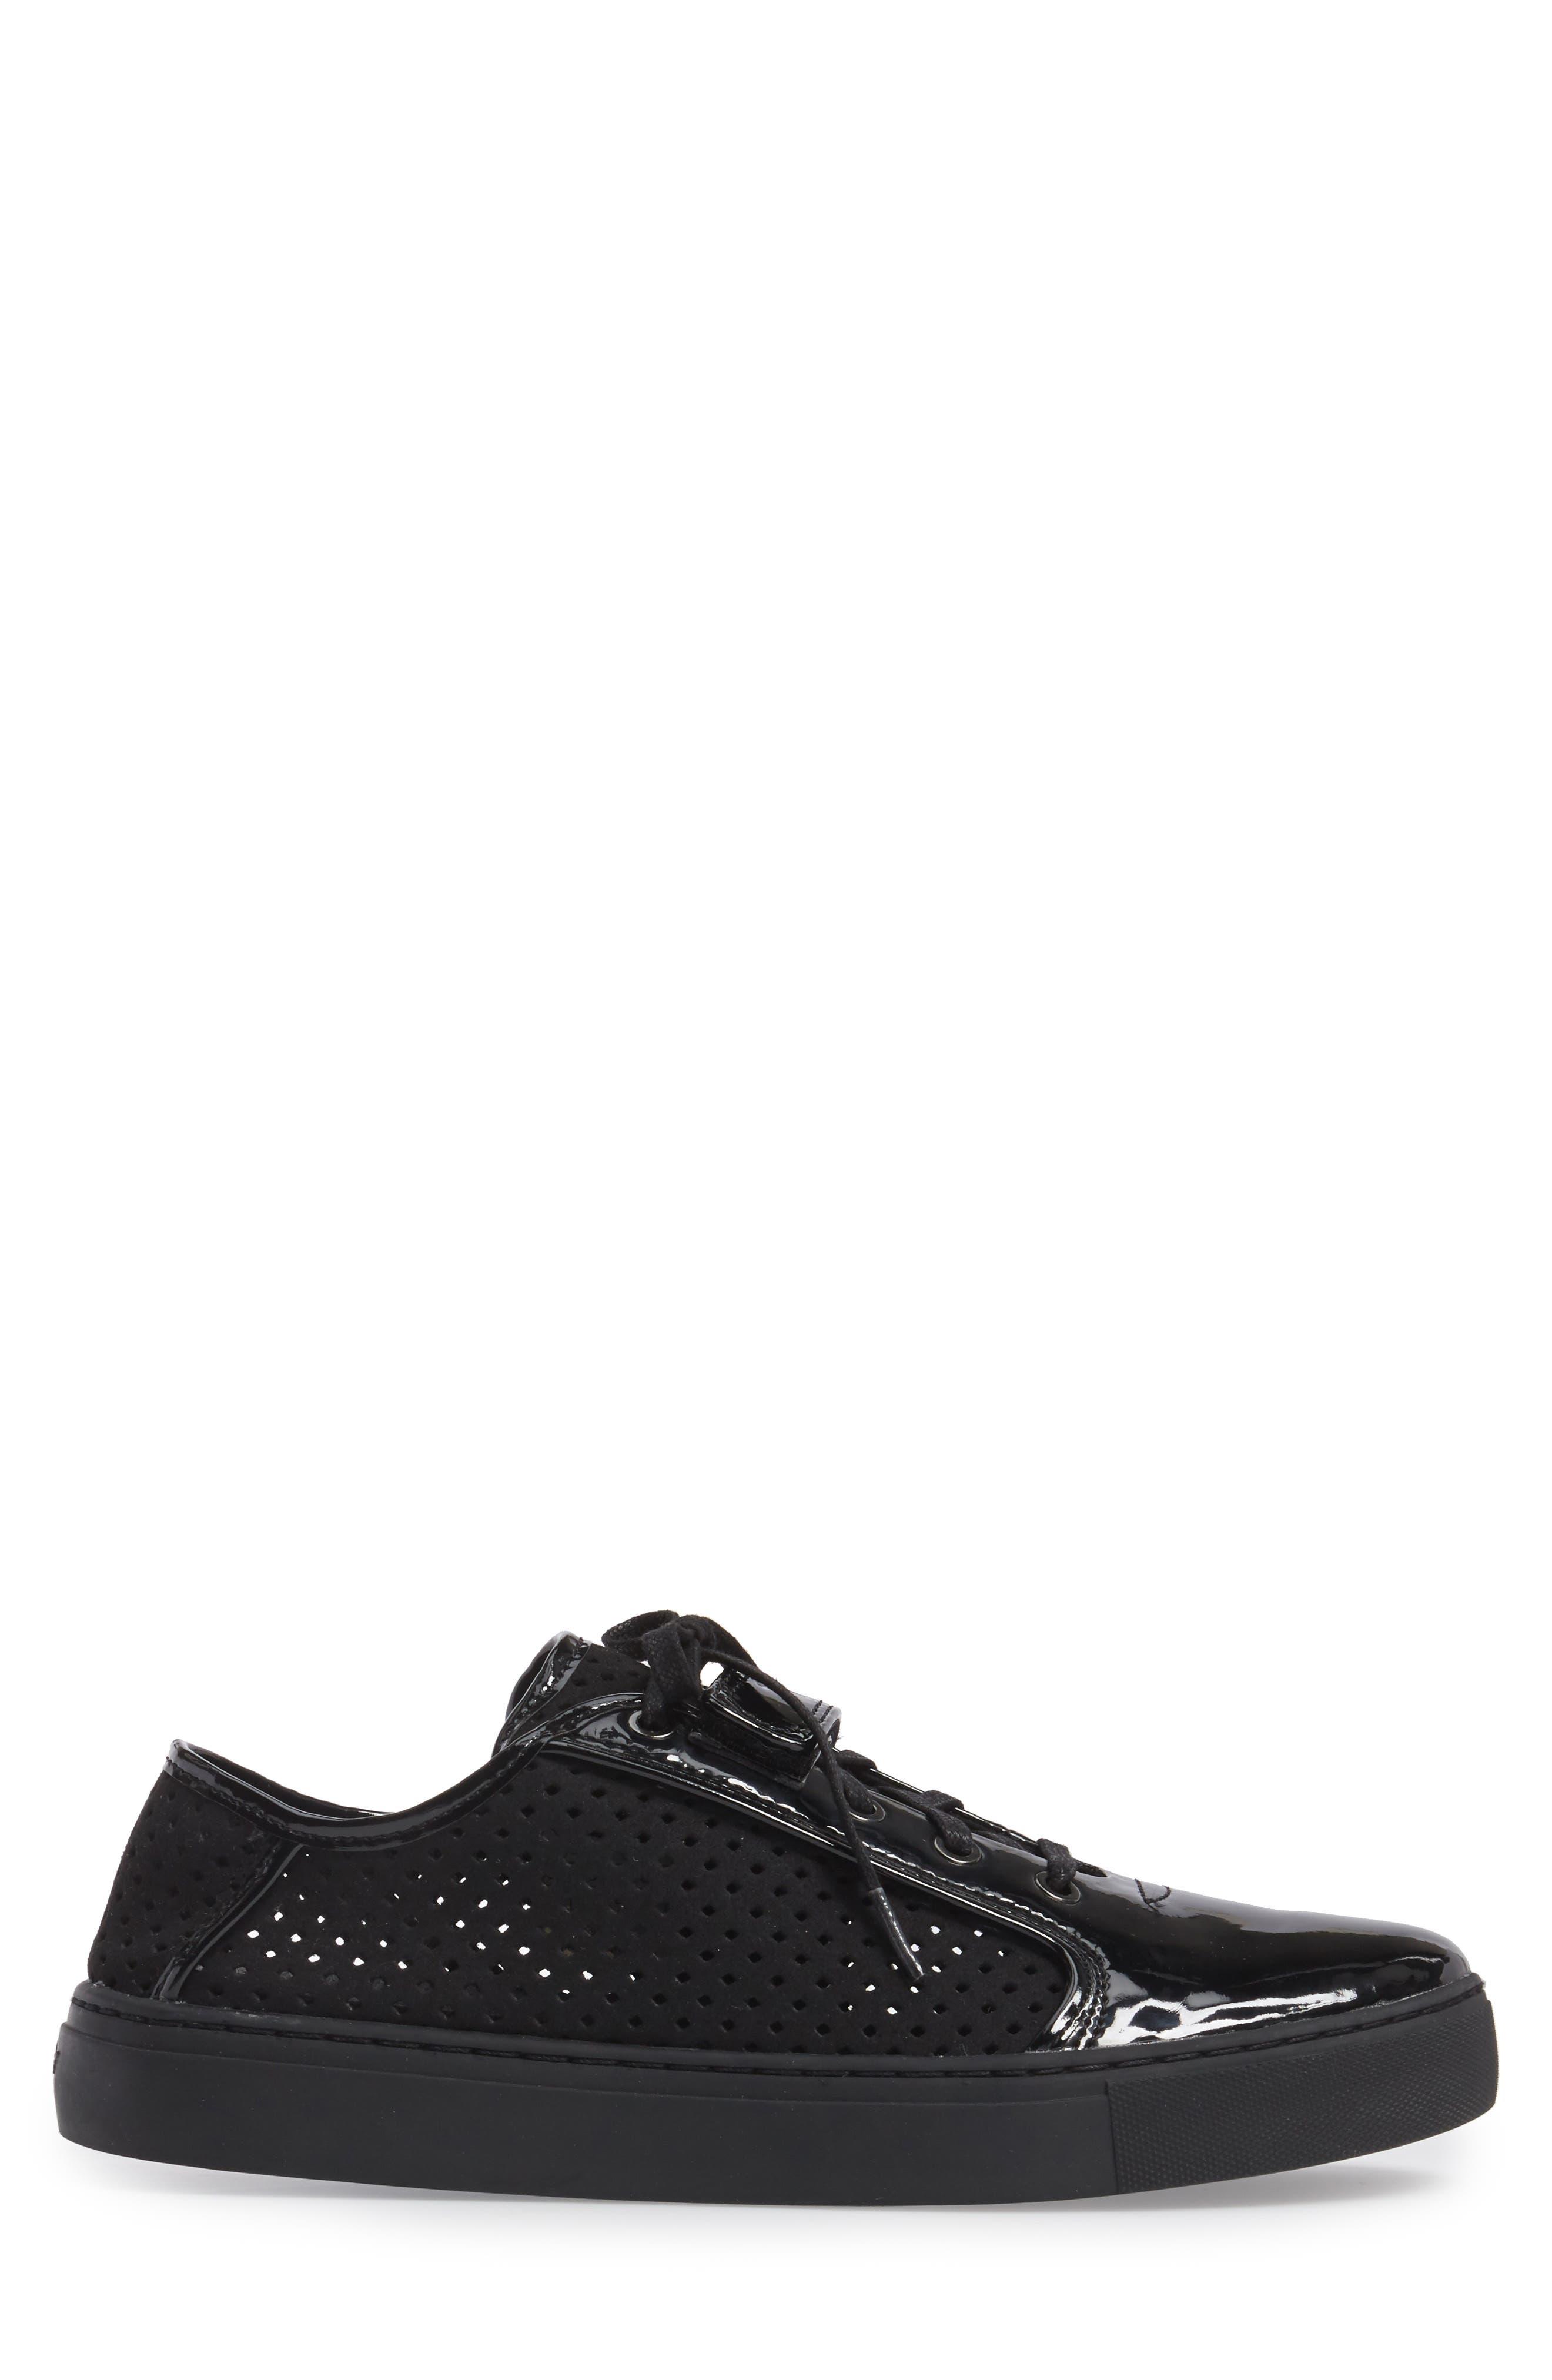 Pagno Sneaker,                             Alternate thumbnail 3, color,                             001